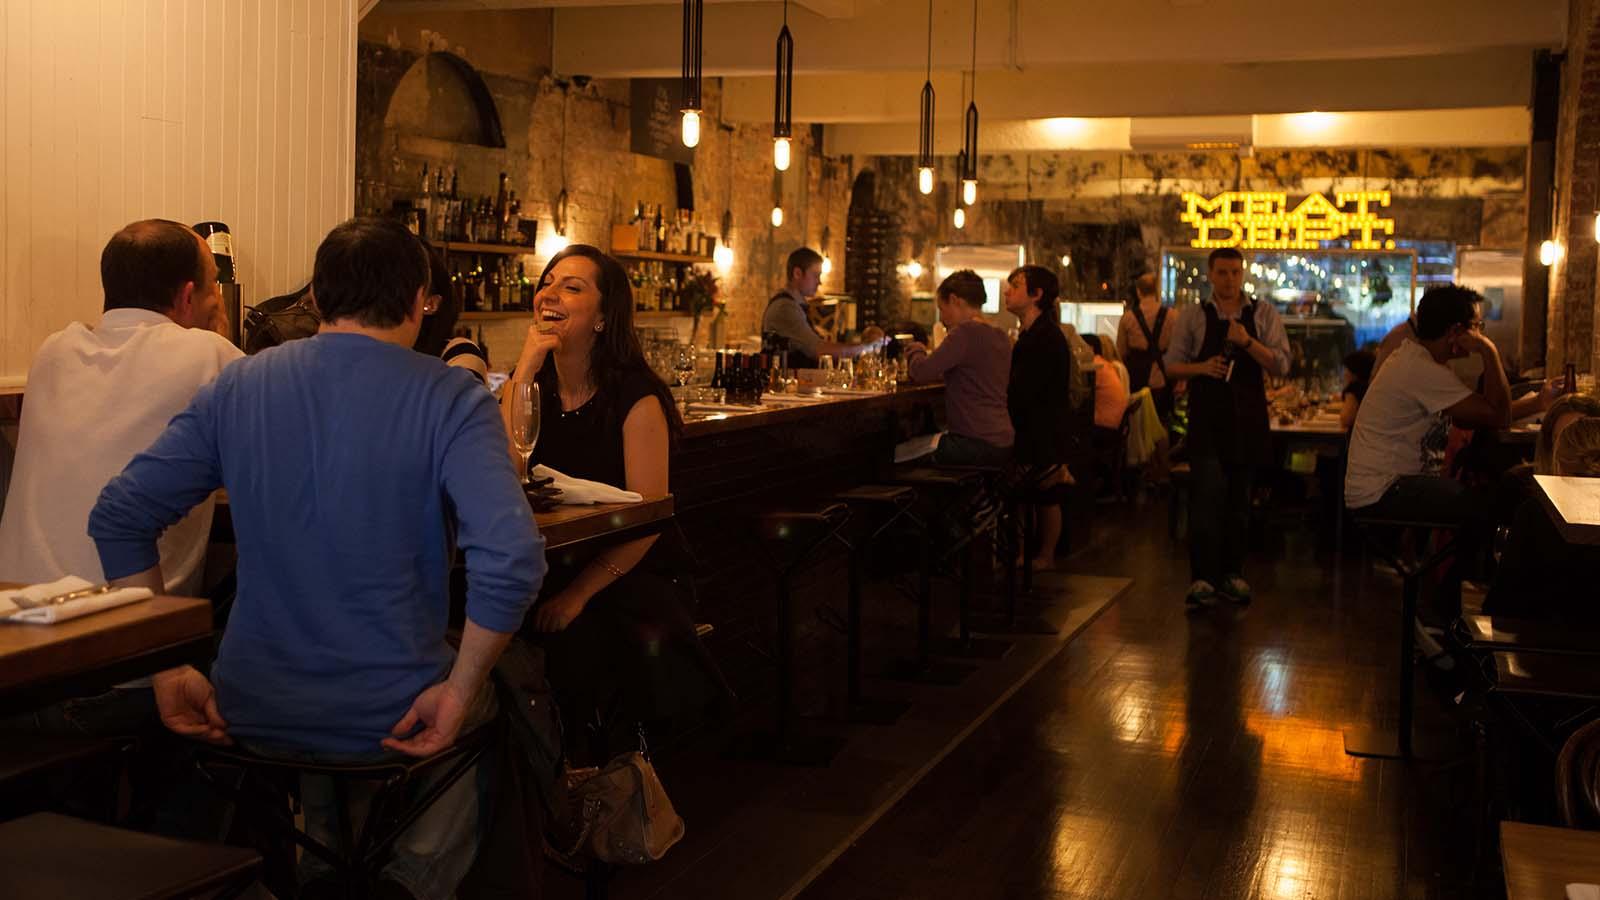 Meatball and Wine Bar, Melbourne, Victoria, Australia